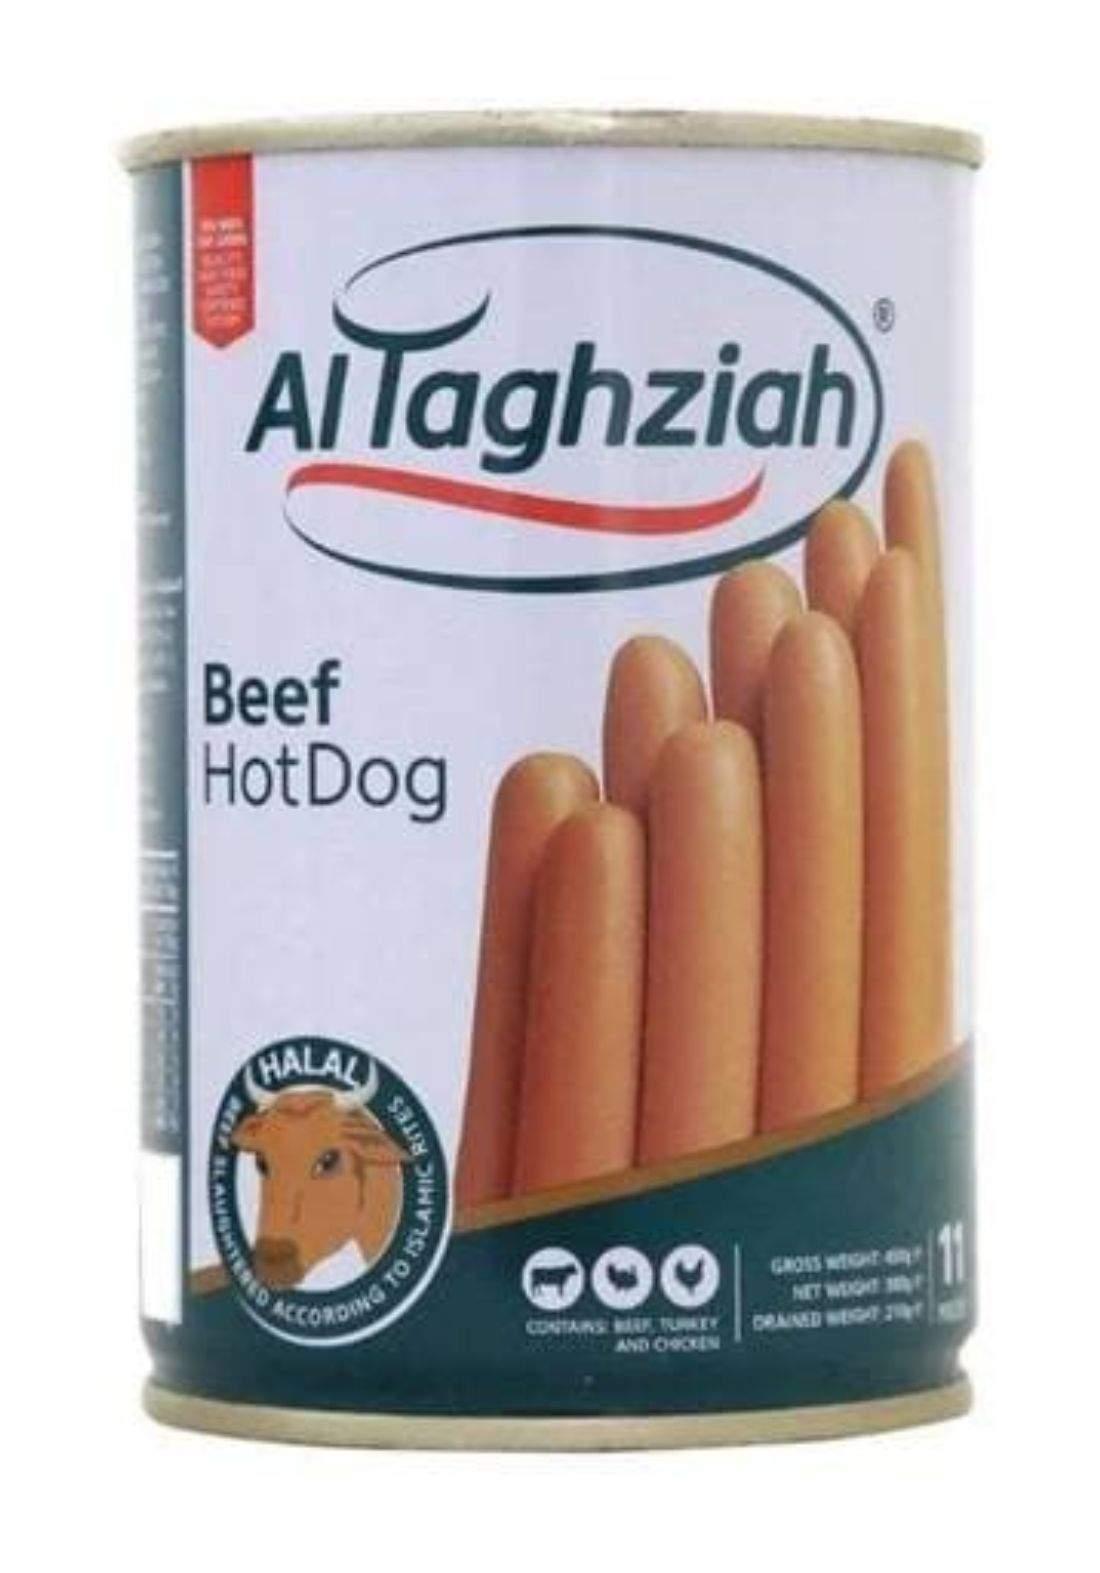 Altaghziah beef hot dog 11pieces التغذية هوت دوغ بقري